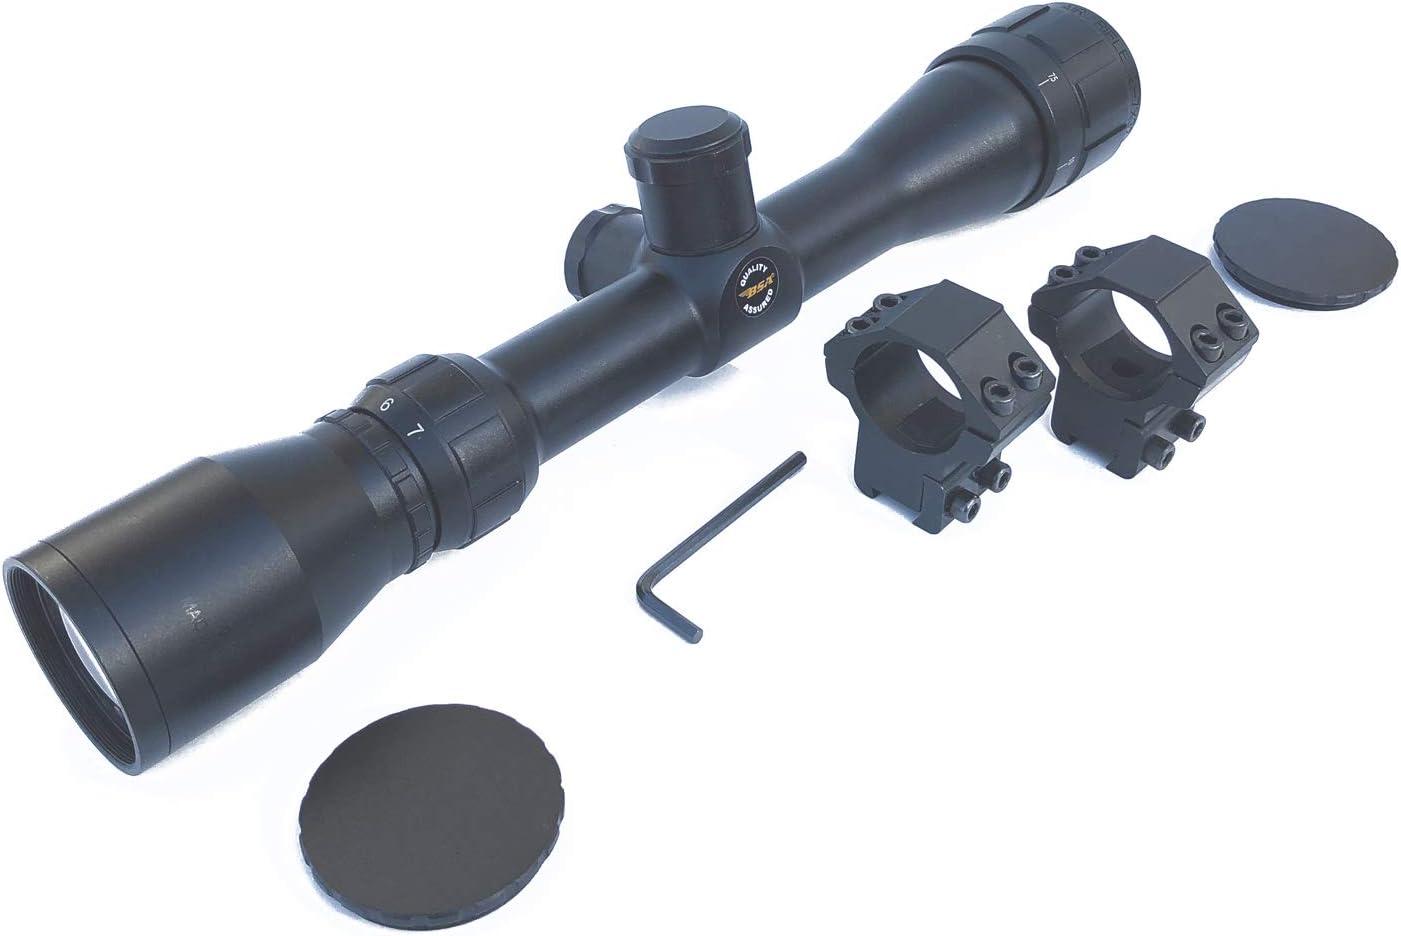 Visor BSA. Mira telescópica con zoom AR27X32. Objetivo ajustable. Especial para tiro deportivo. Monturas incluidas. 46360/3010